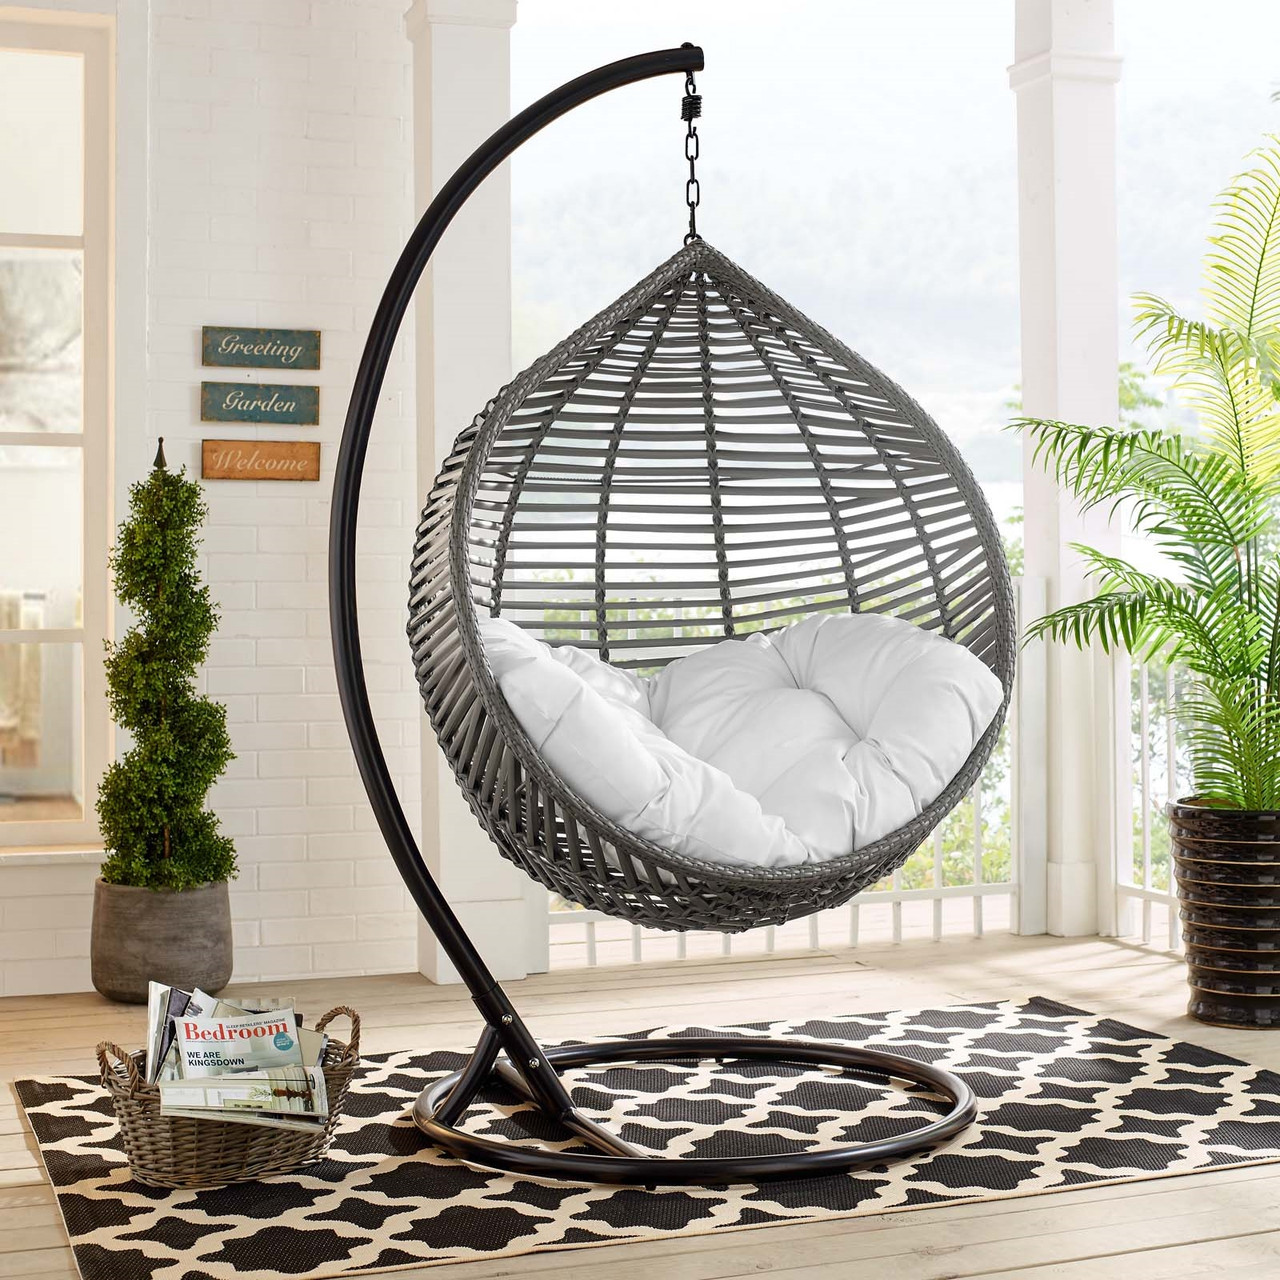 modway garner teardrop outdoor patio swing chair gray white